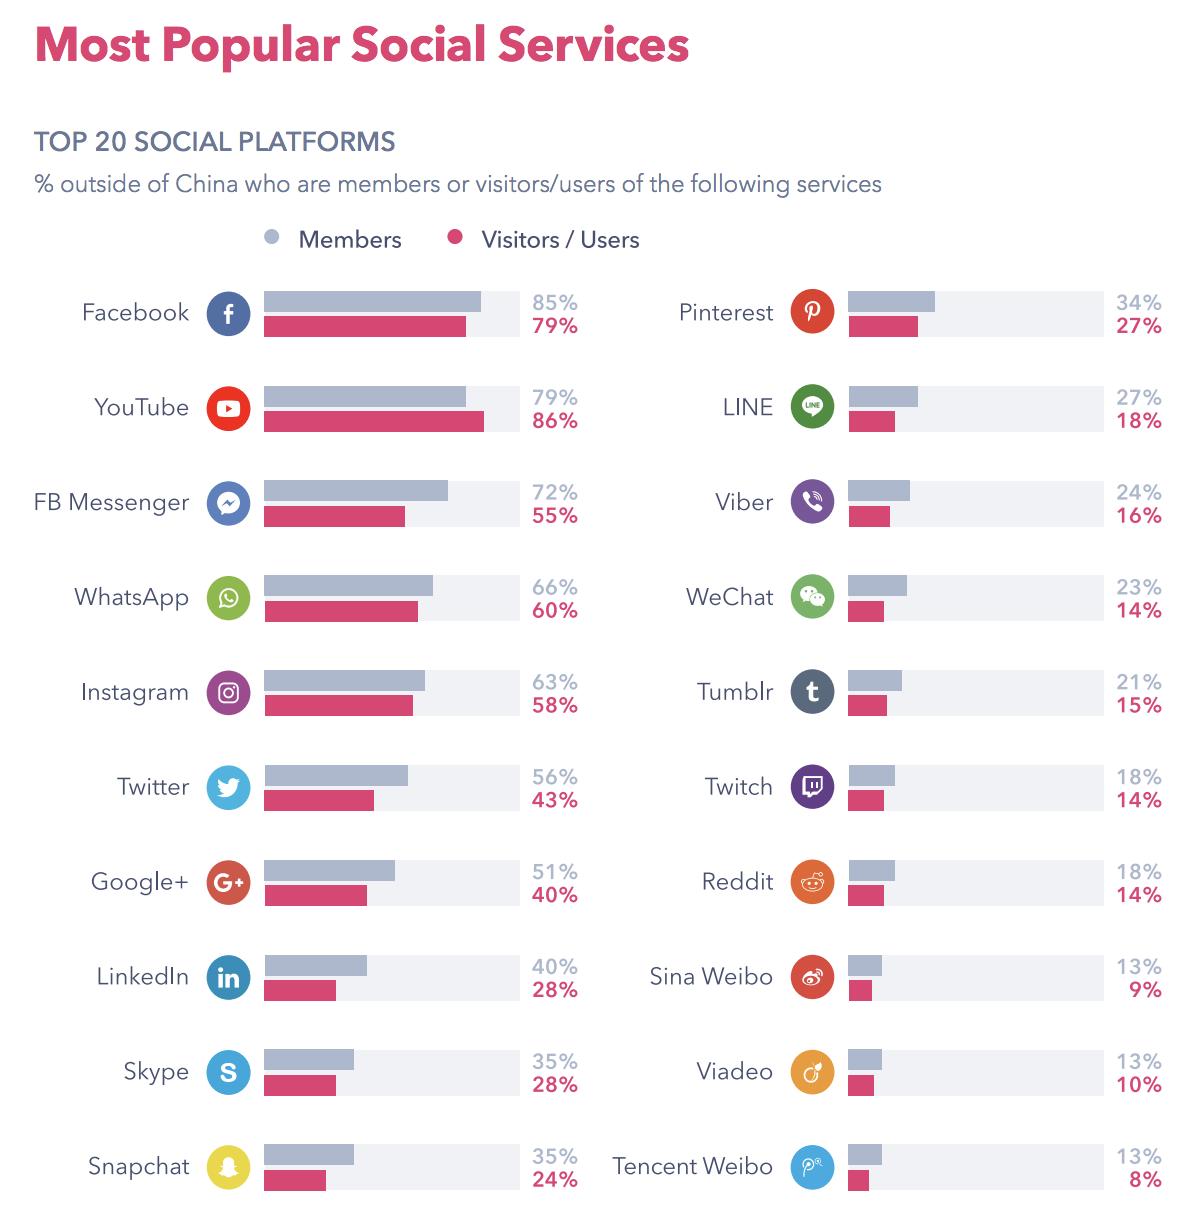 Top 20 social media networks based on usage